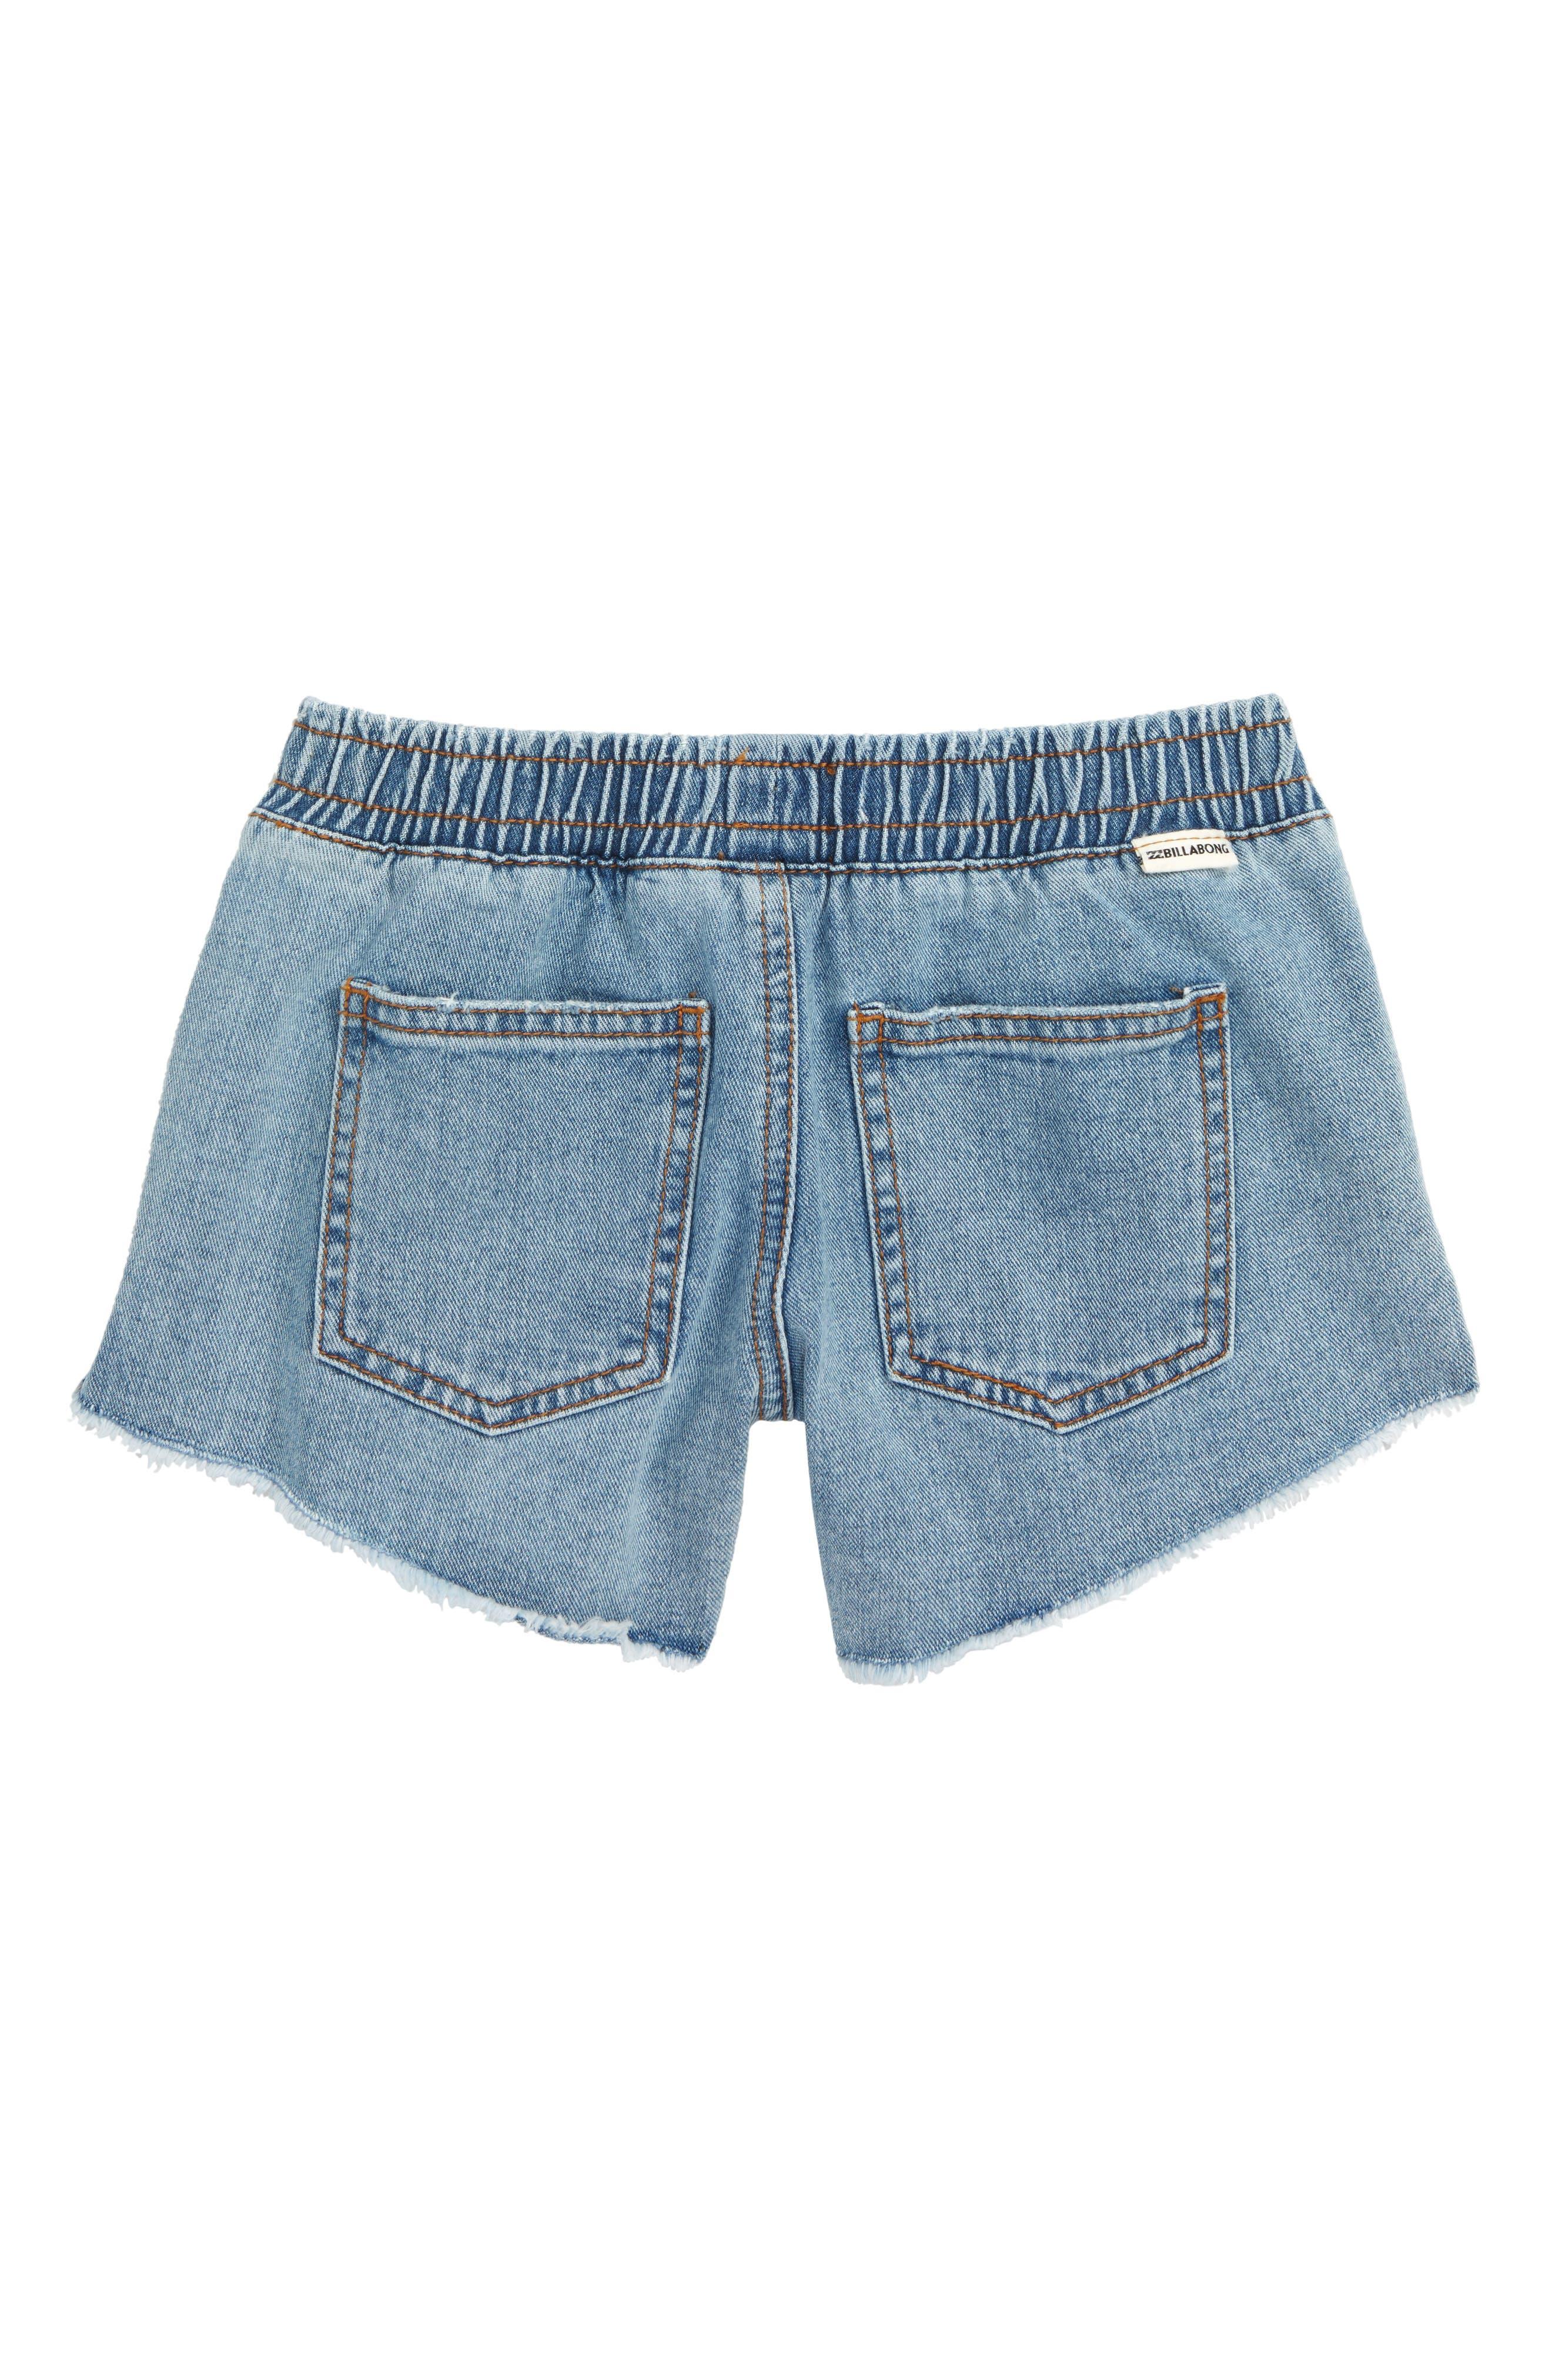 Wild Sun Cutoff Shorts,                             Alternate thumbnail 2, color,                             INDIGO